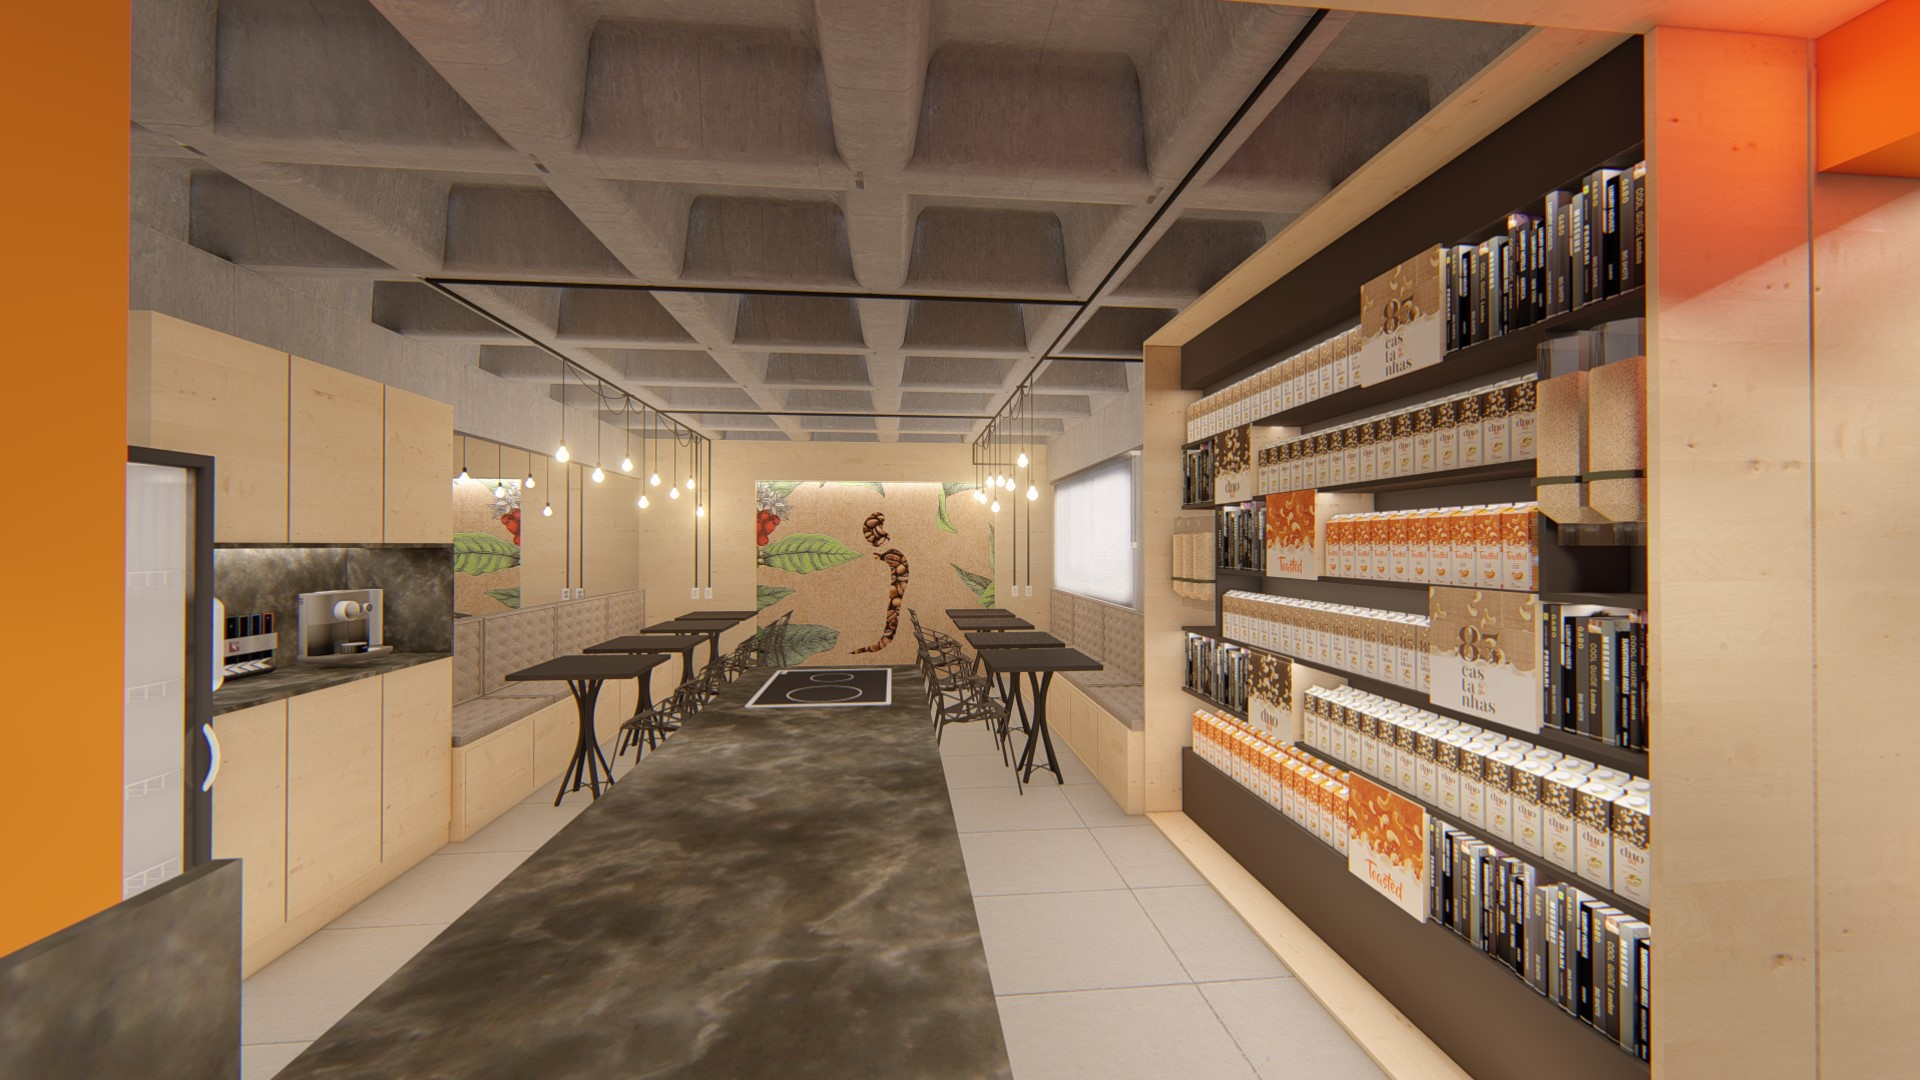 projeto-arquitetonico-cajueiro-duo-arquitetura-02.jpg